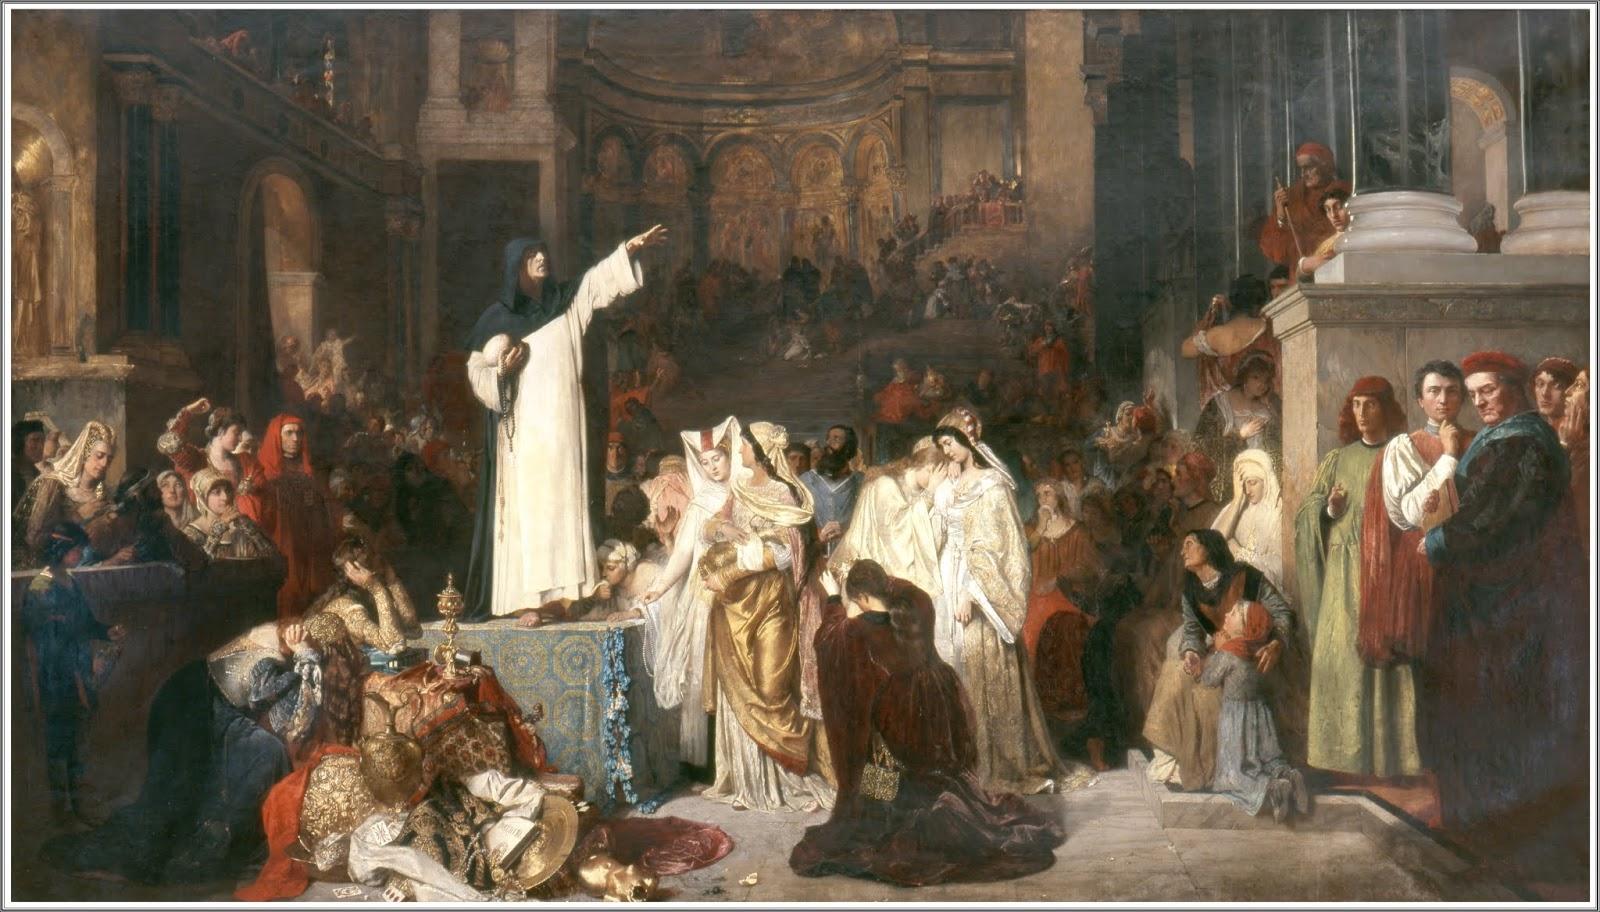 5850a6e67317 Ludwig von Langenmantel (1854-1922), Savonarole Prêchant contre la  Prodigalité - 1879